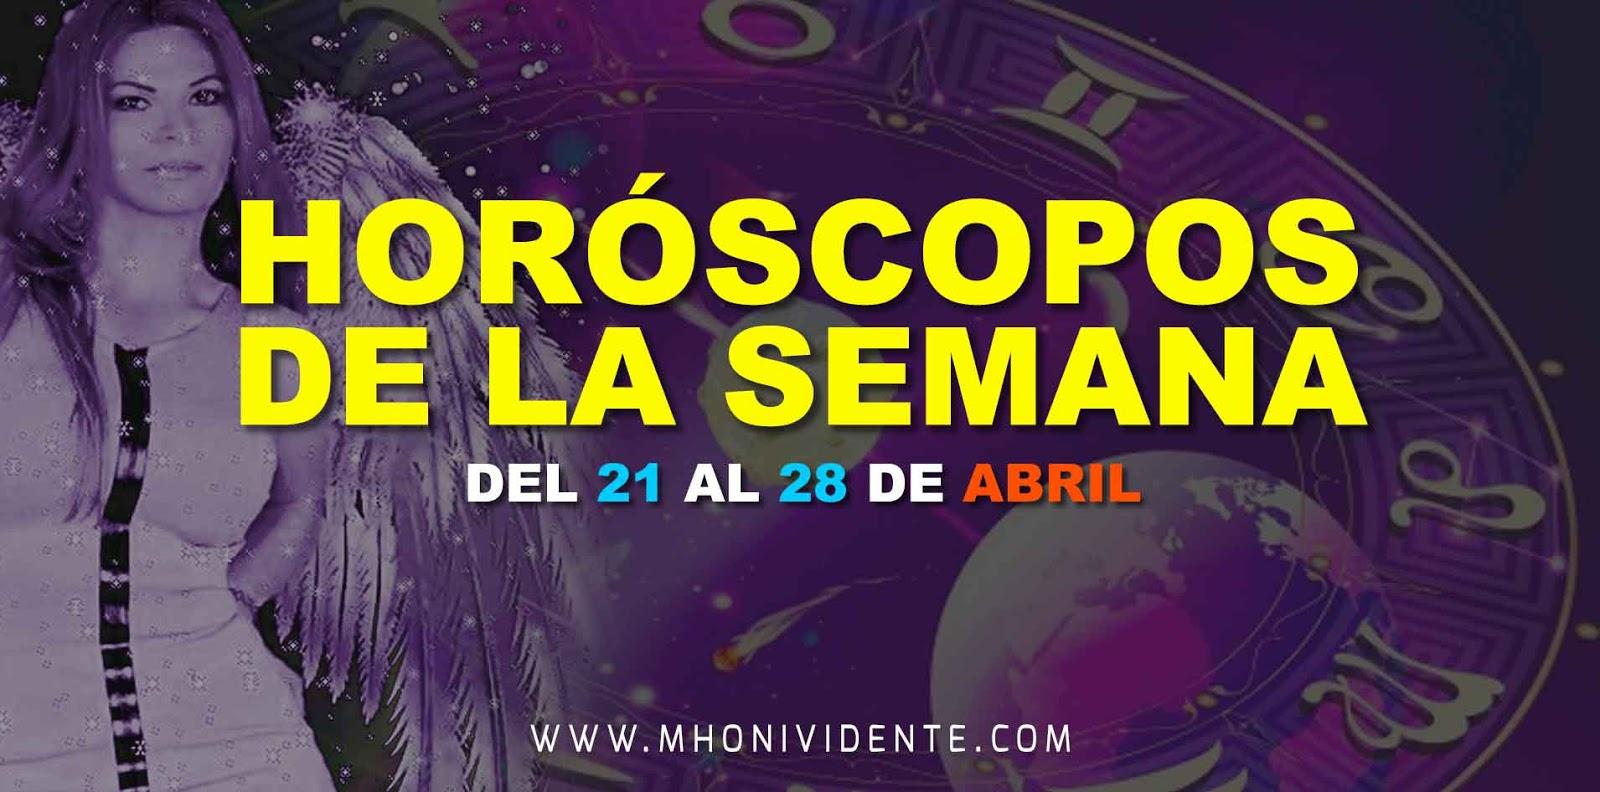 HORÓSCOPOS DE LA SEMANA DE MHONI VIDENTE - DEL 21 AL 28 DE ABRIL